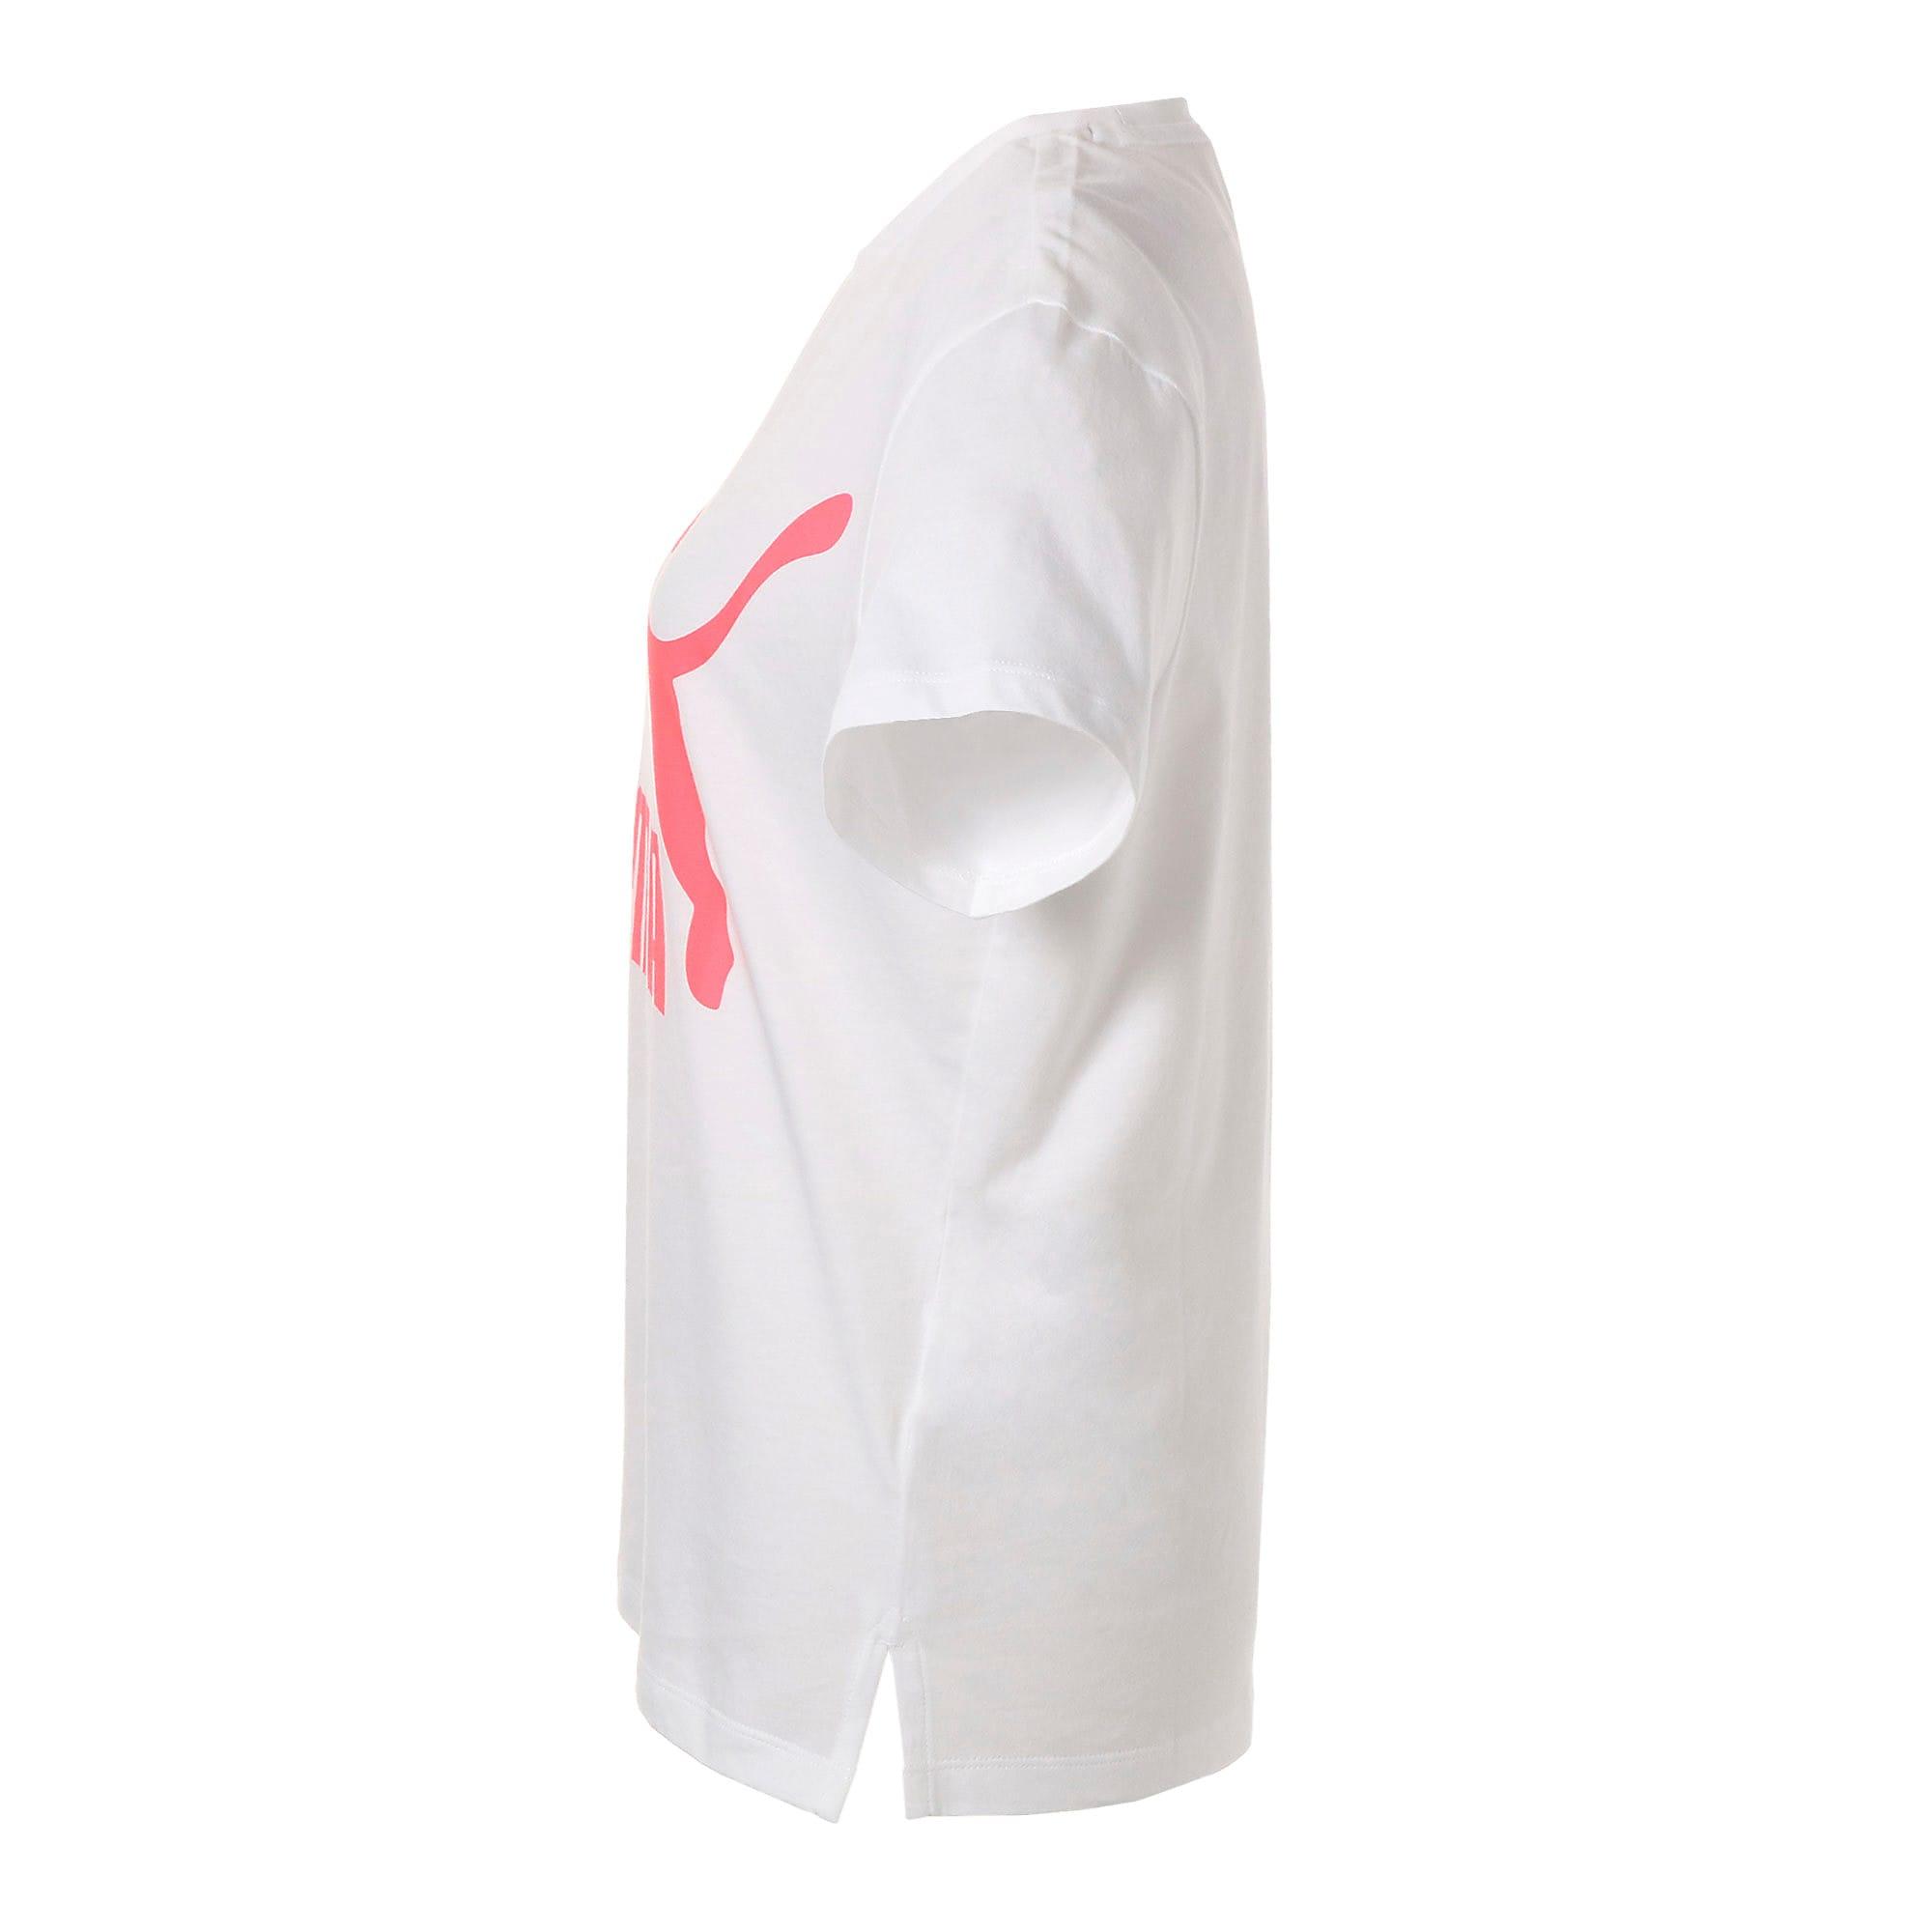 Thumbnail 6 of CLASSICS ロゴ ウィメンズ SS Tシャツ, Puma White, medium-JPN